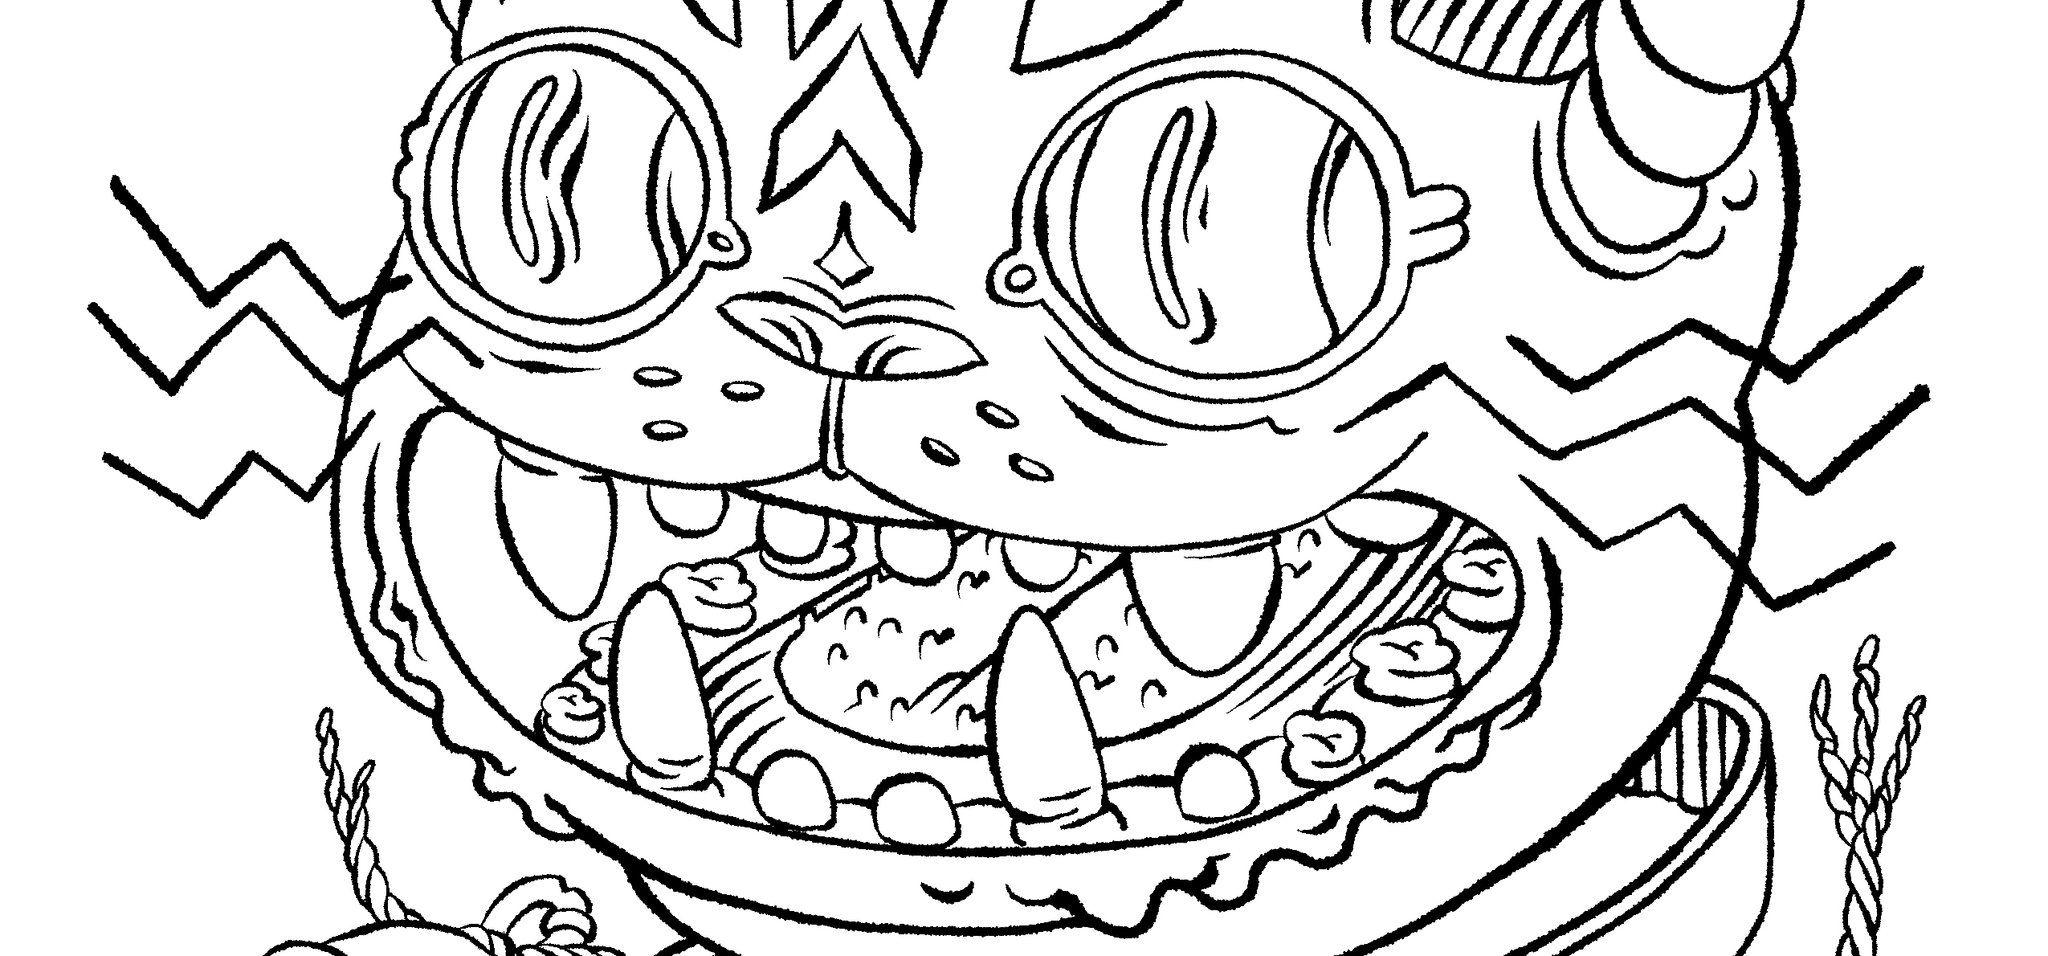 Space Cat Coloring Page | Cat coloring page, Coloring ...